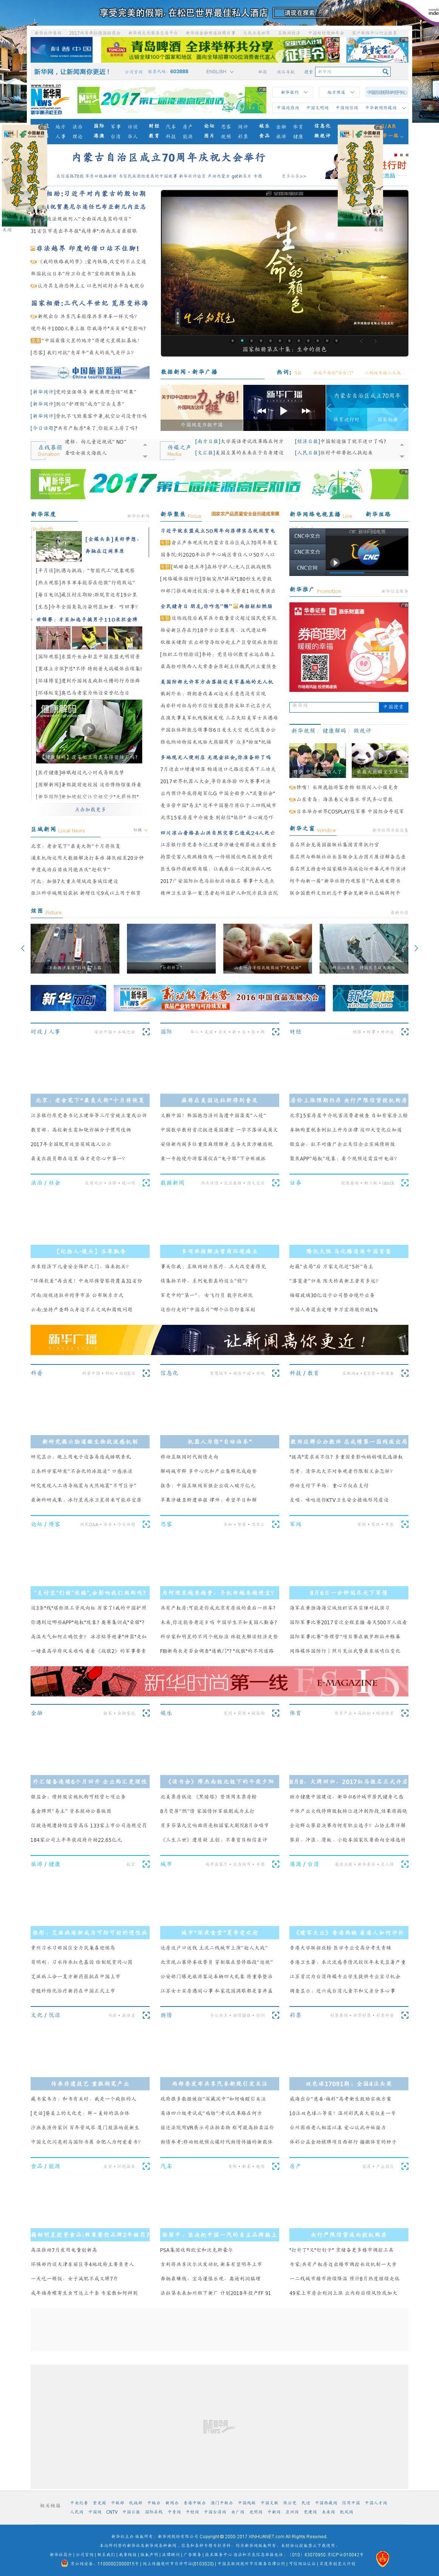 Xinhua at Tuesday Aug. 8, 2017, 1:29 p.m. UTC